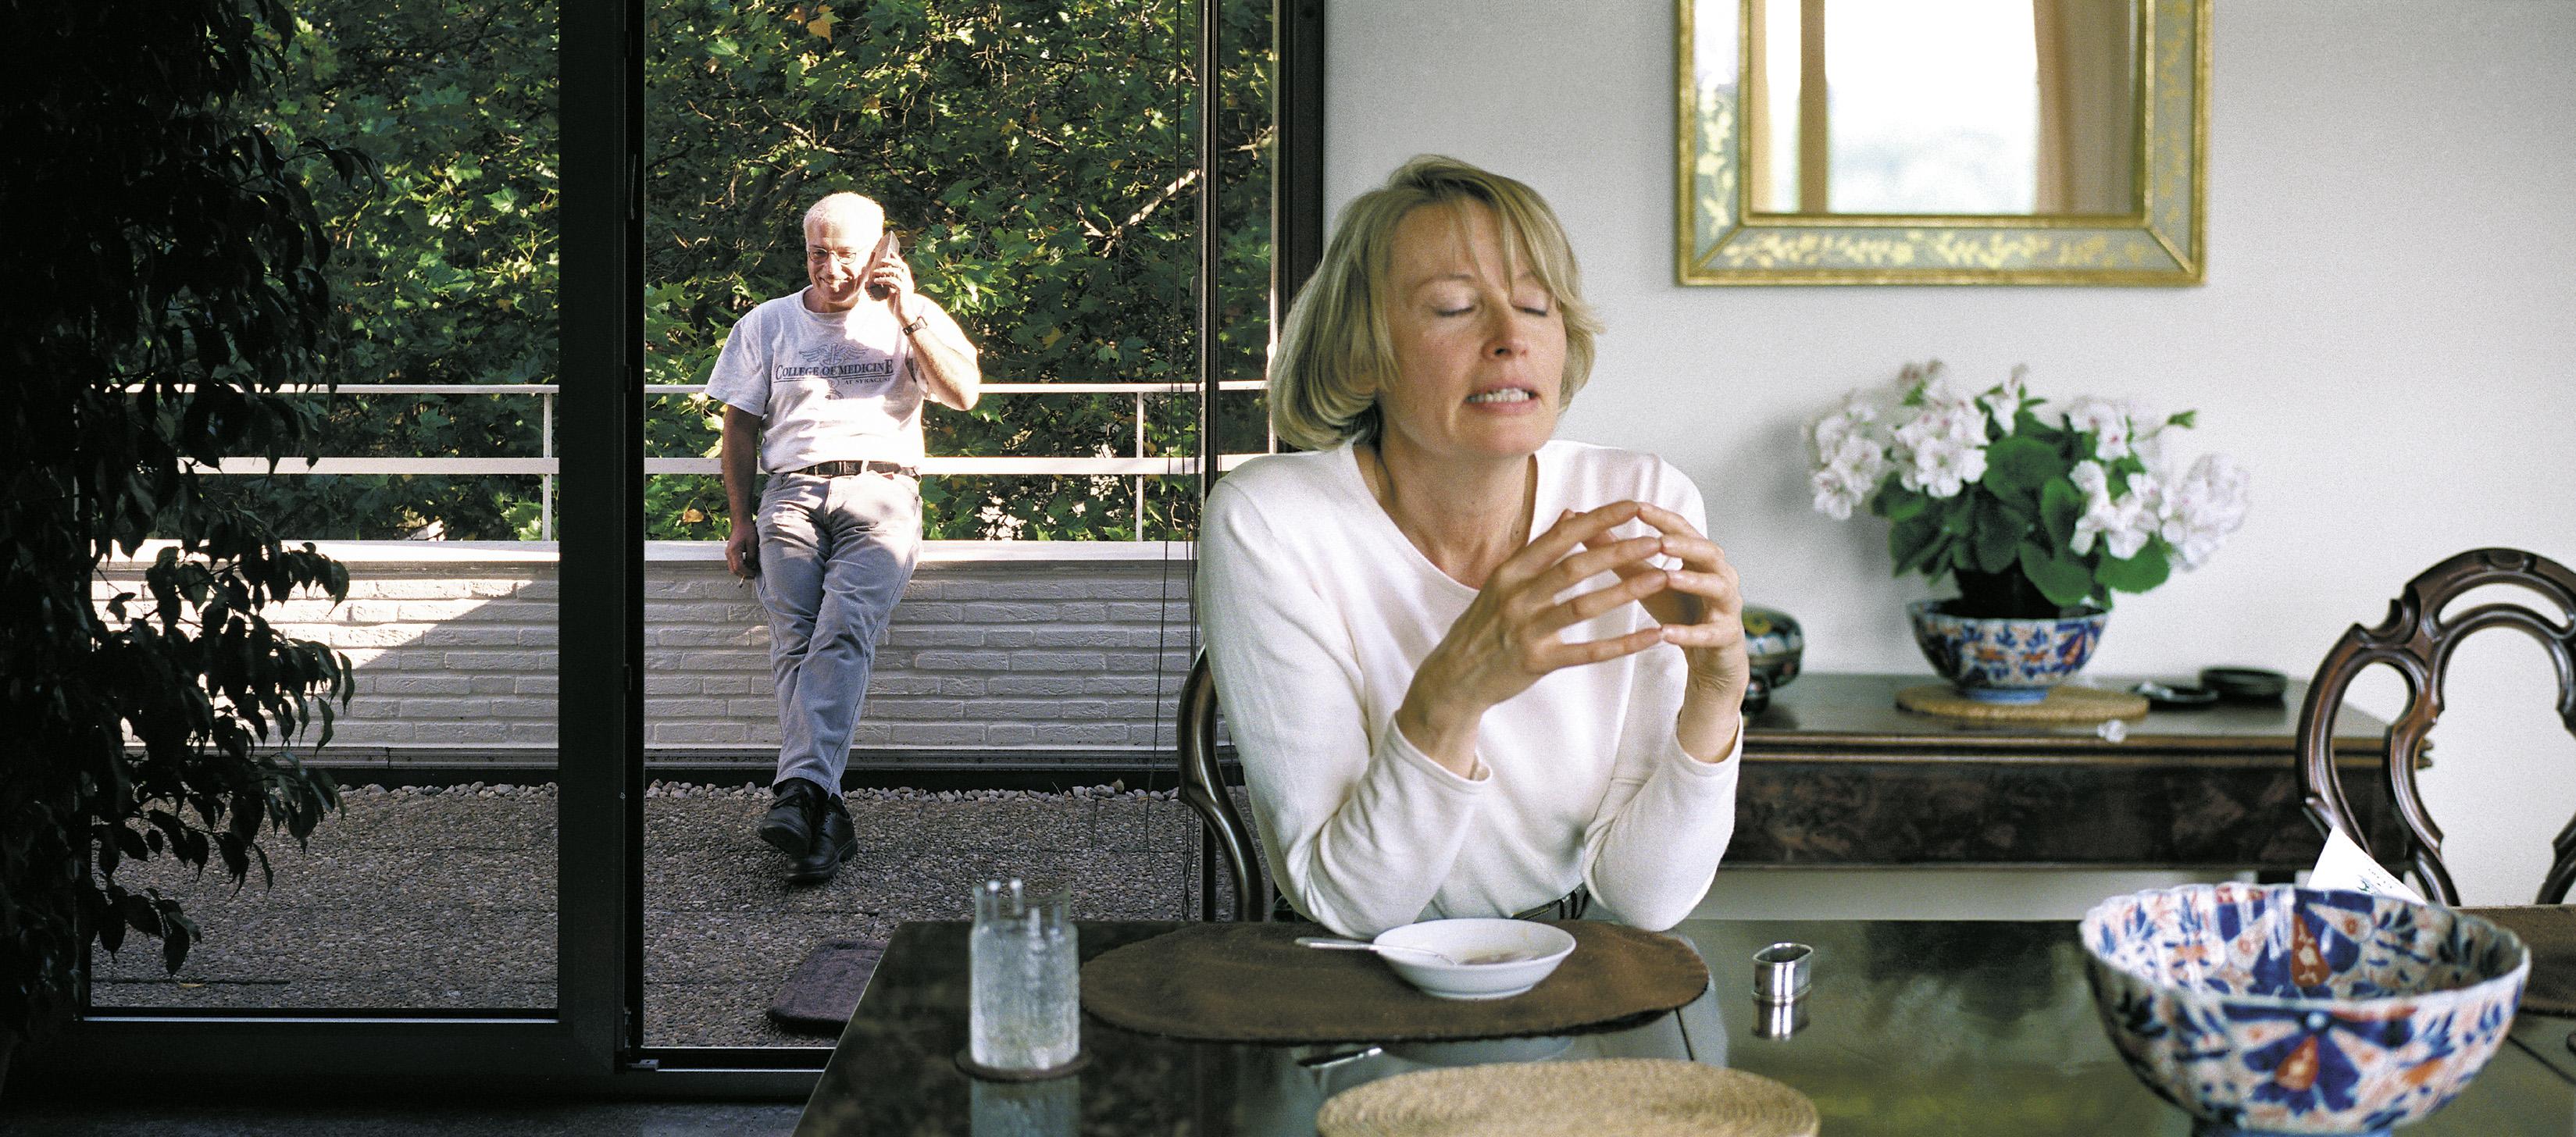 Christopher Muller, Lunch, 2000, C-Print hinter Acrylglas, 52x118 (Copyright: C. Muller)